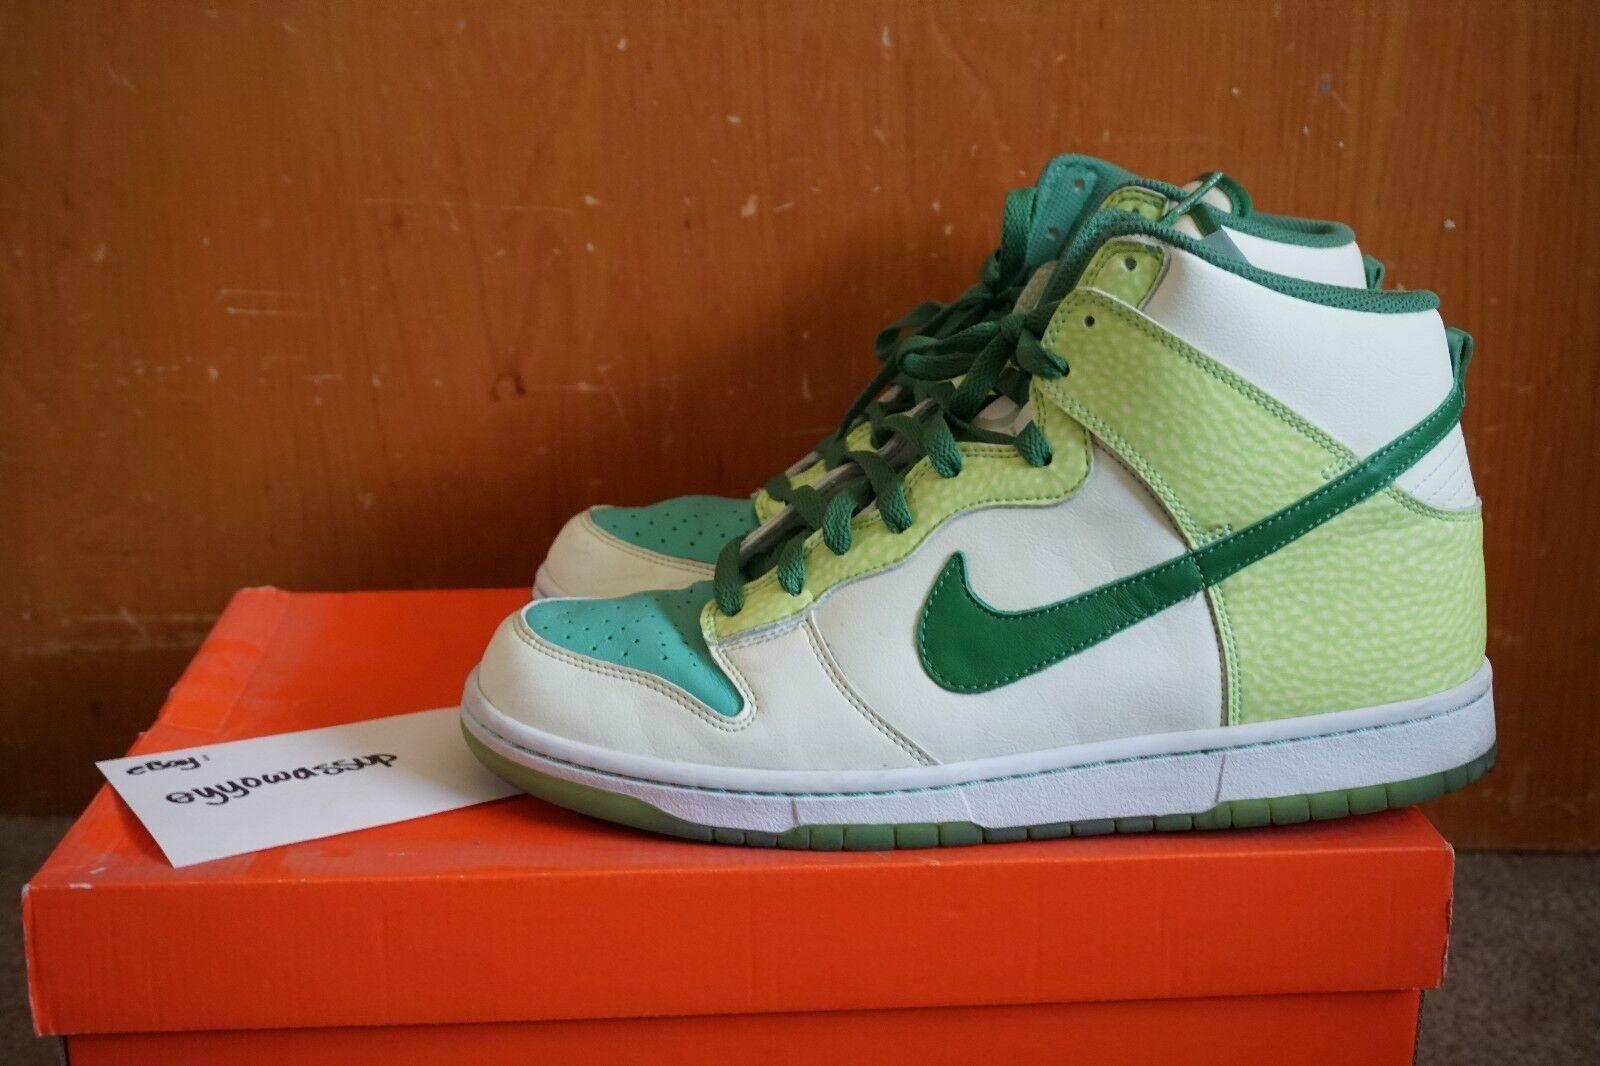 Nike Dunk High Glow In The Dark Comfortable Brand discount